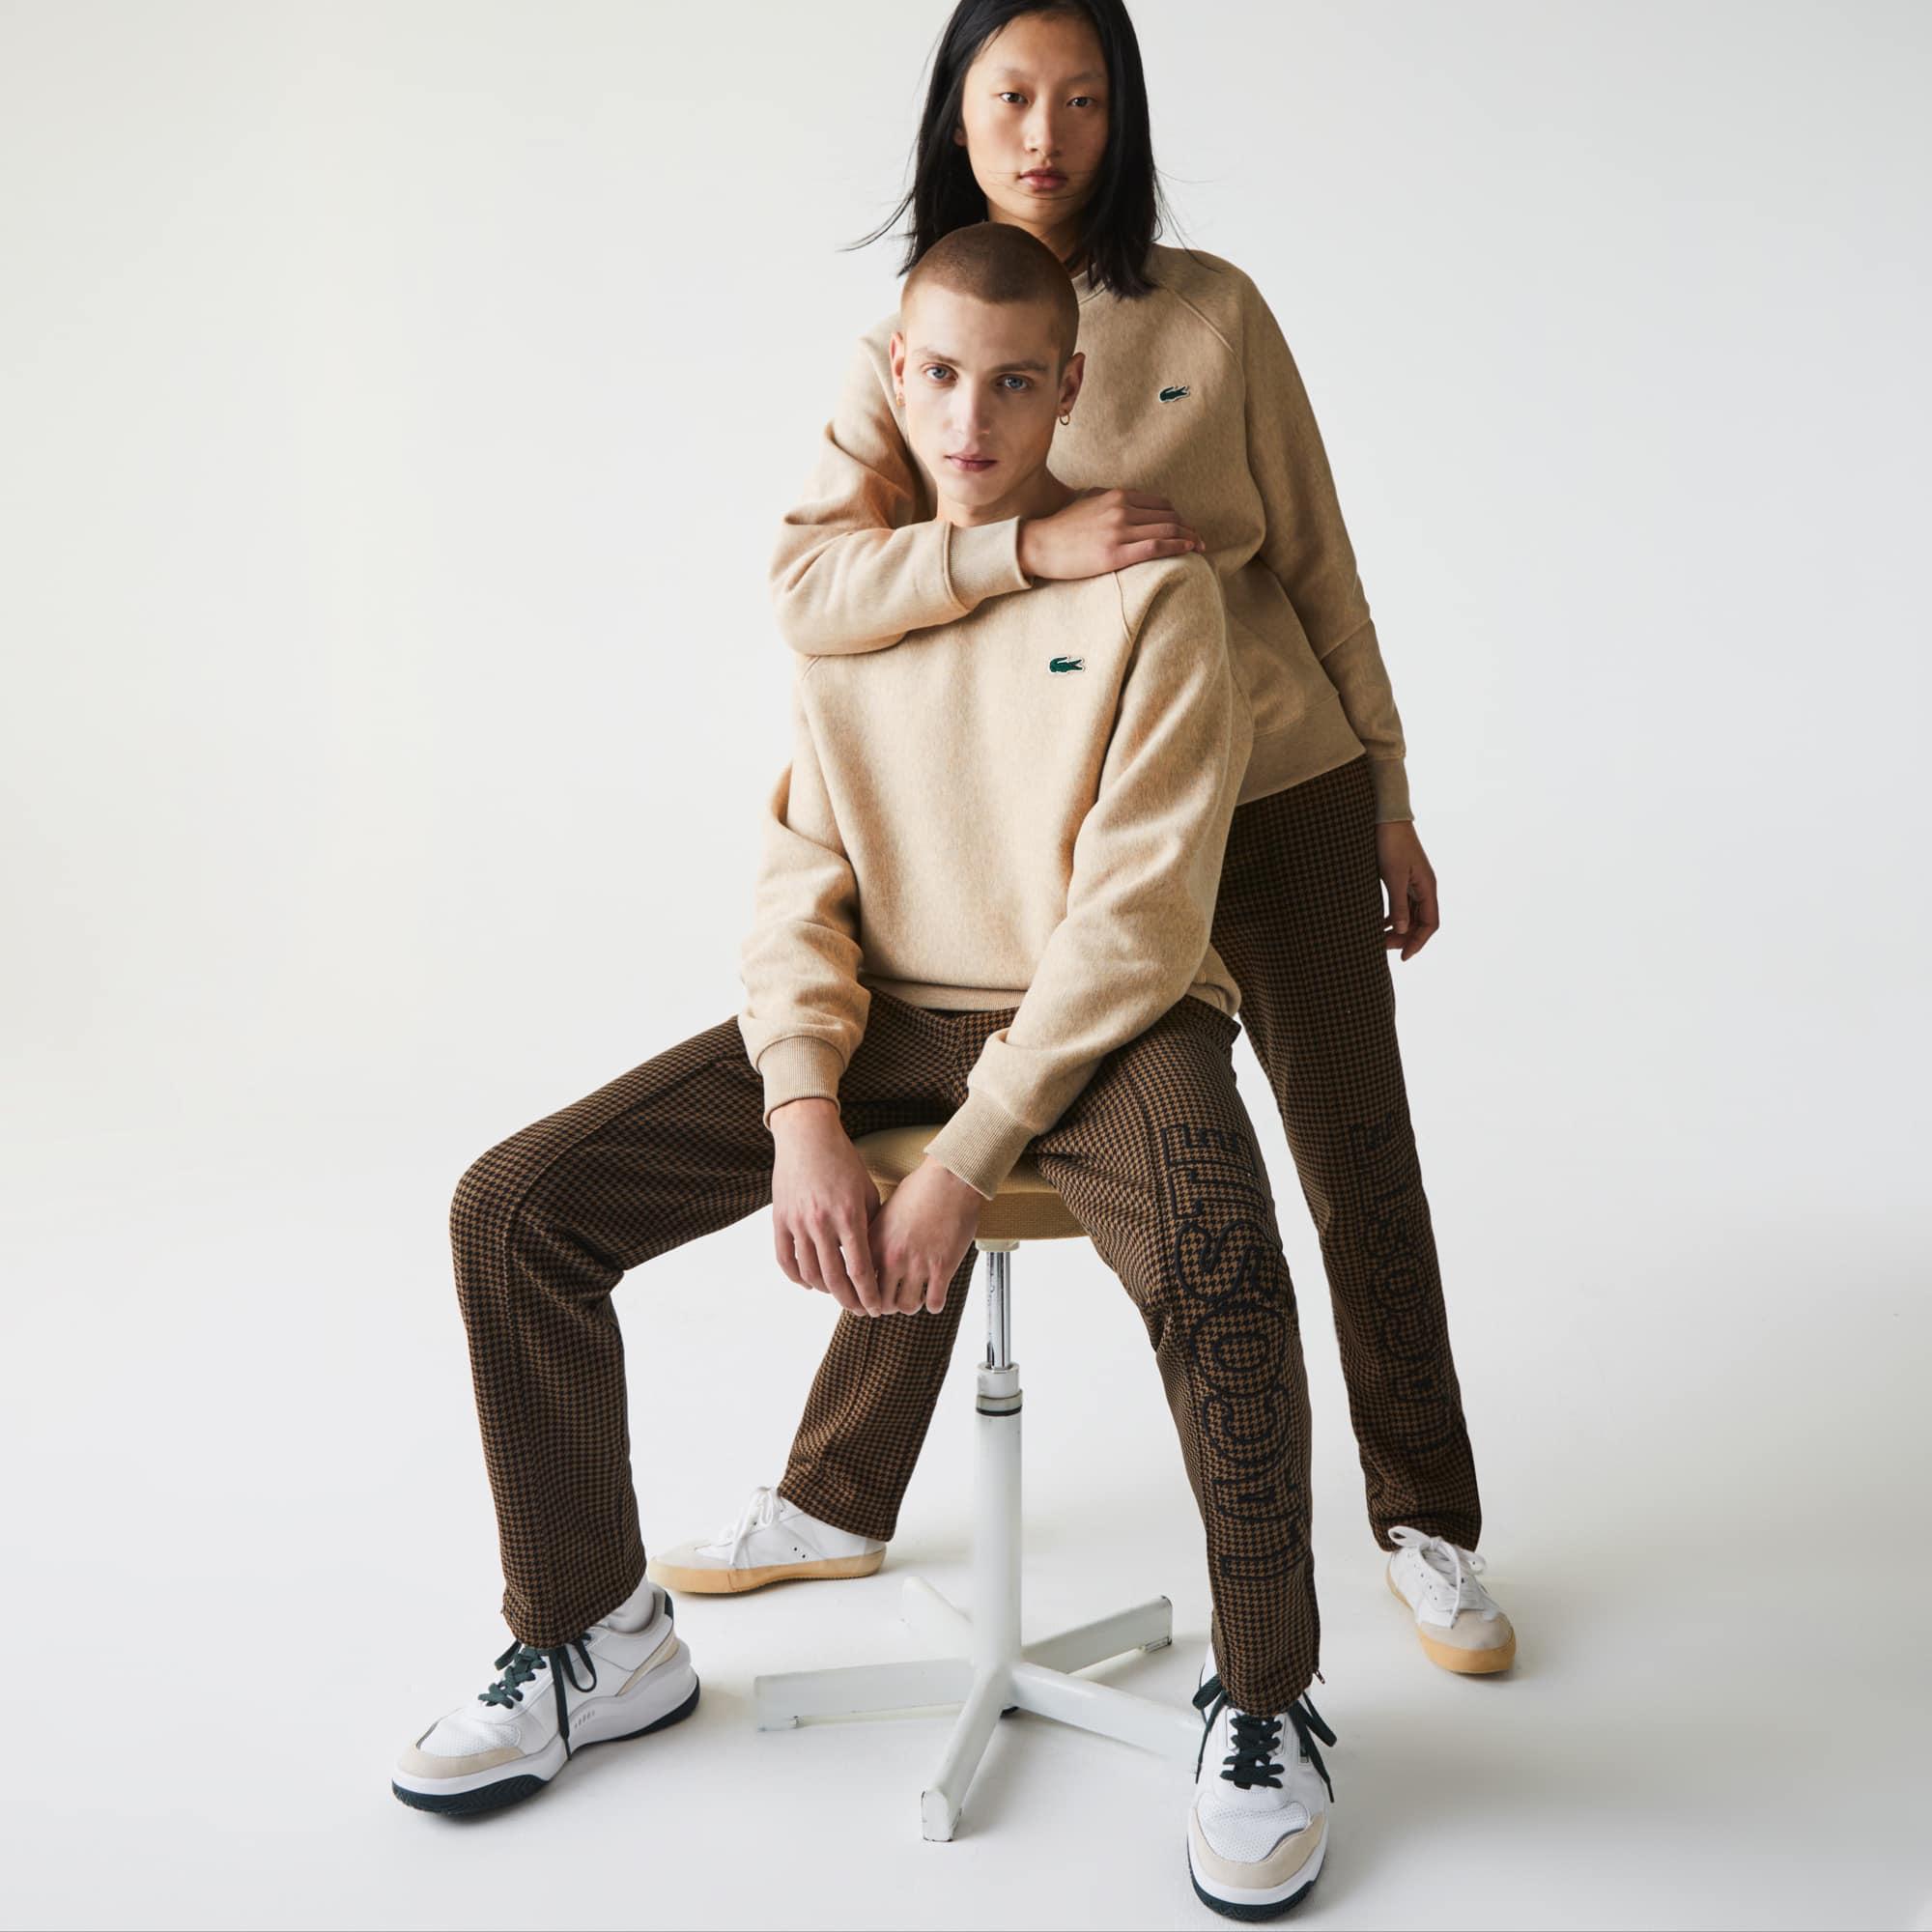 Lacoste Unisex LIVE Branded Fleece Sweatshirt